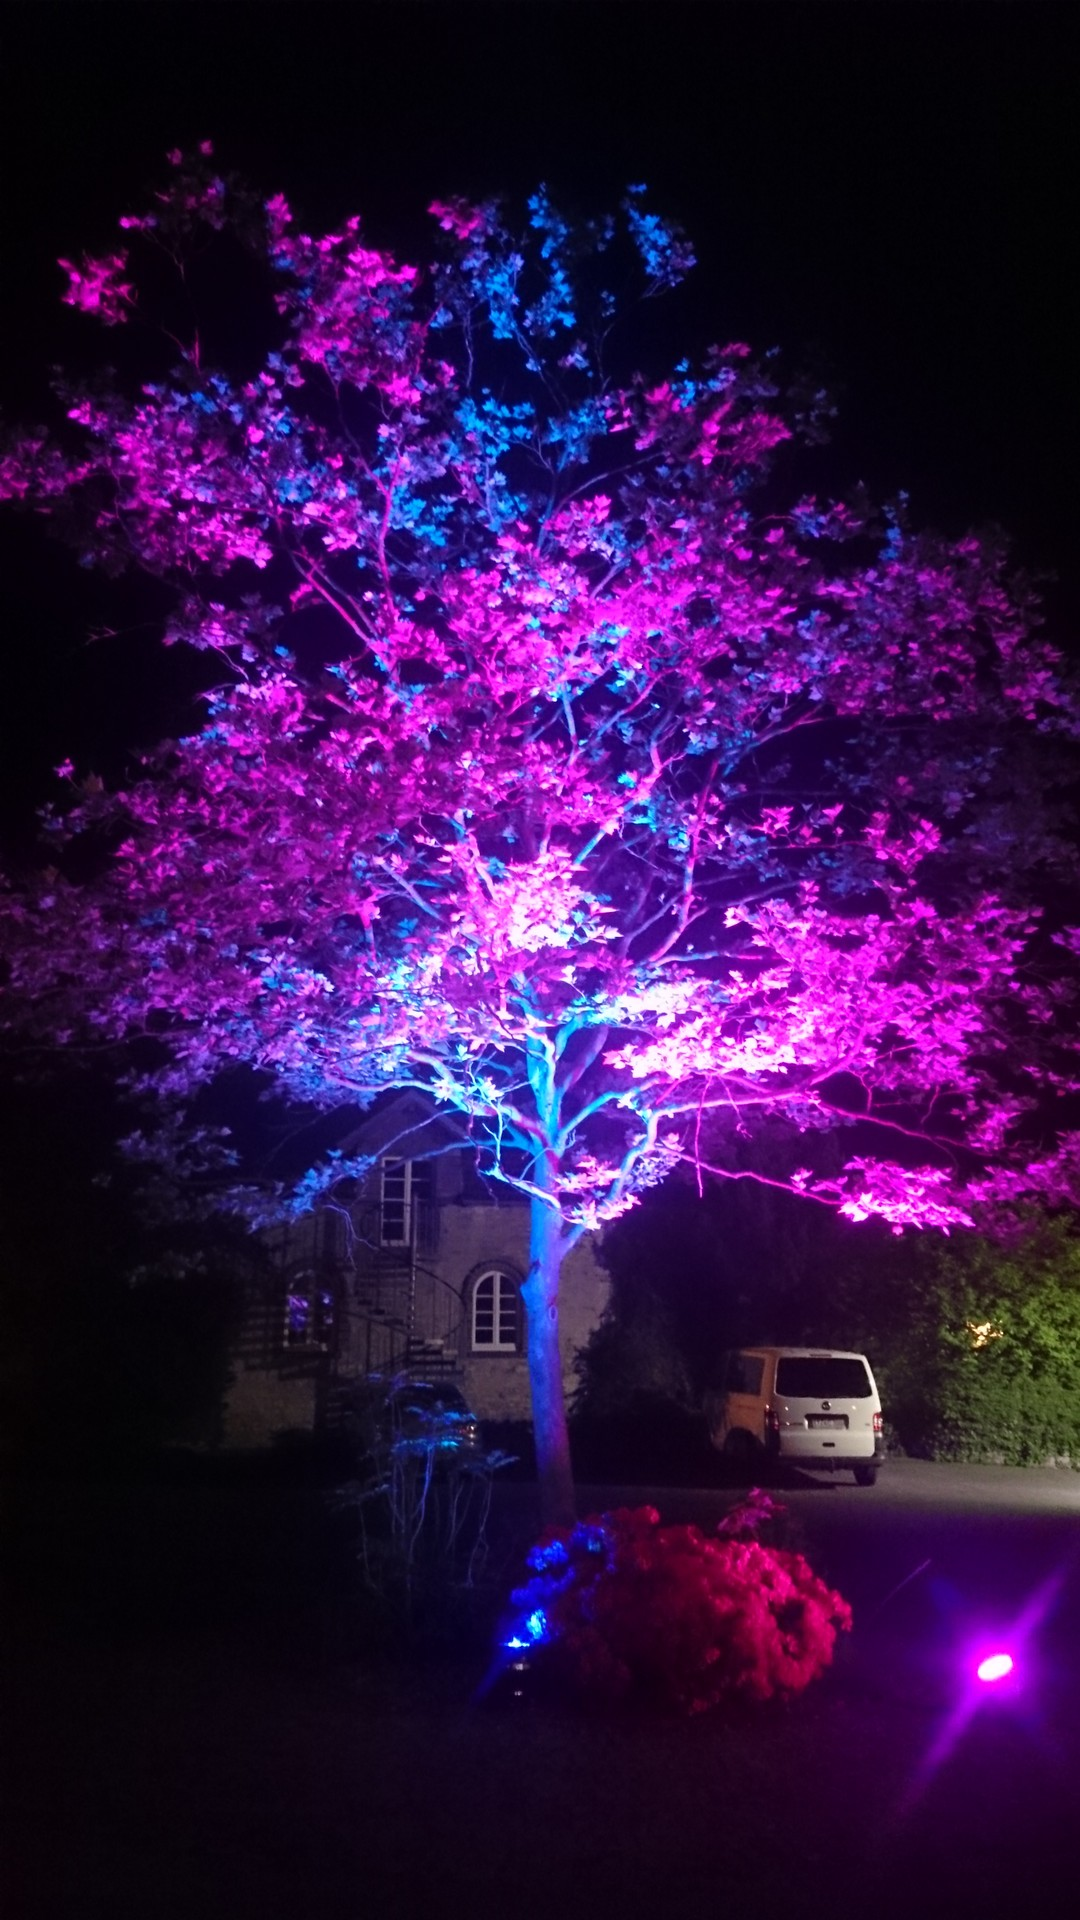 prachtvoll beleuchteter Baum